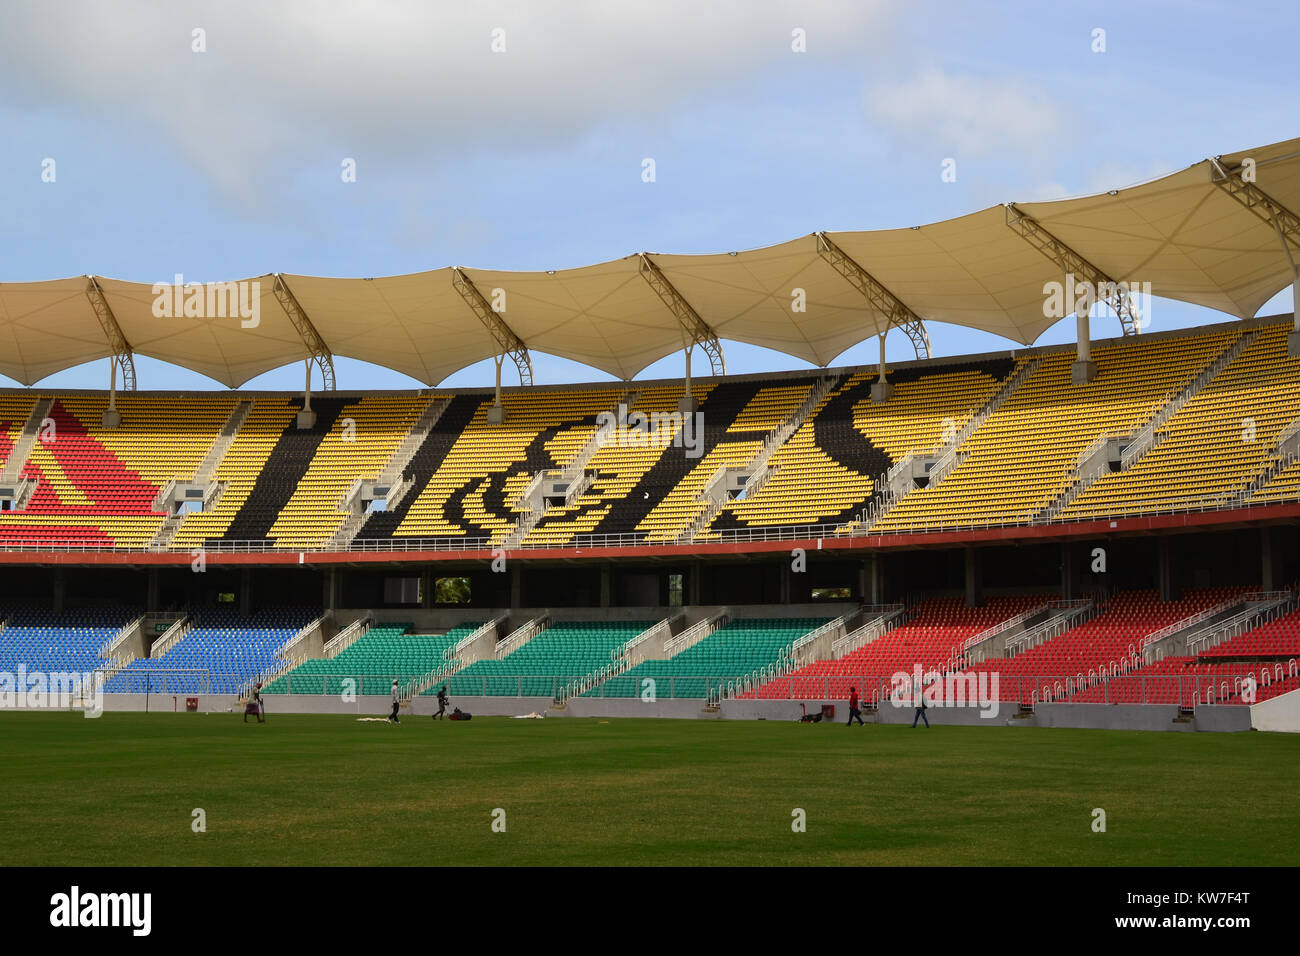 Greenfield Stadium, Trivandrum - Stock Image